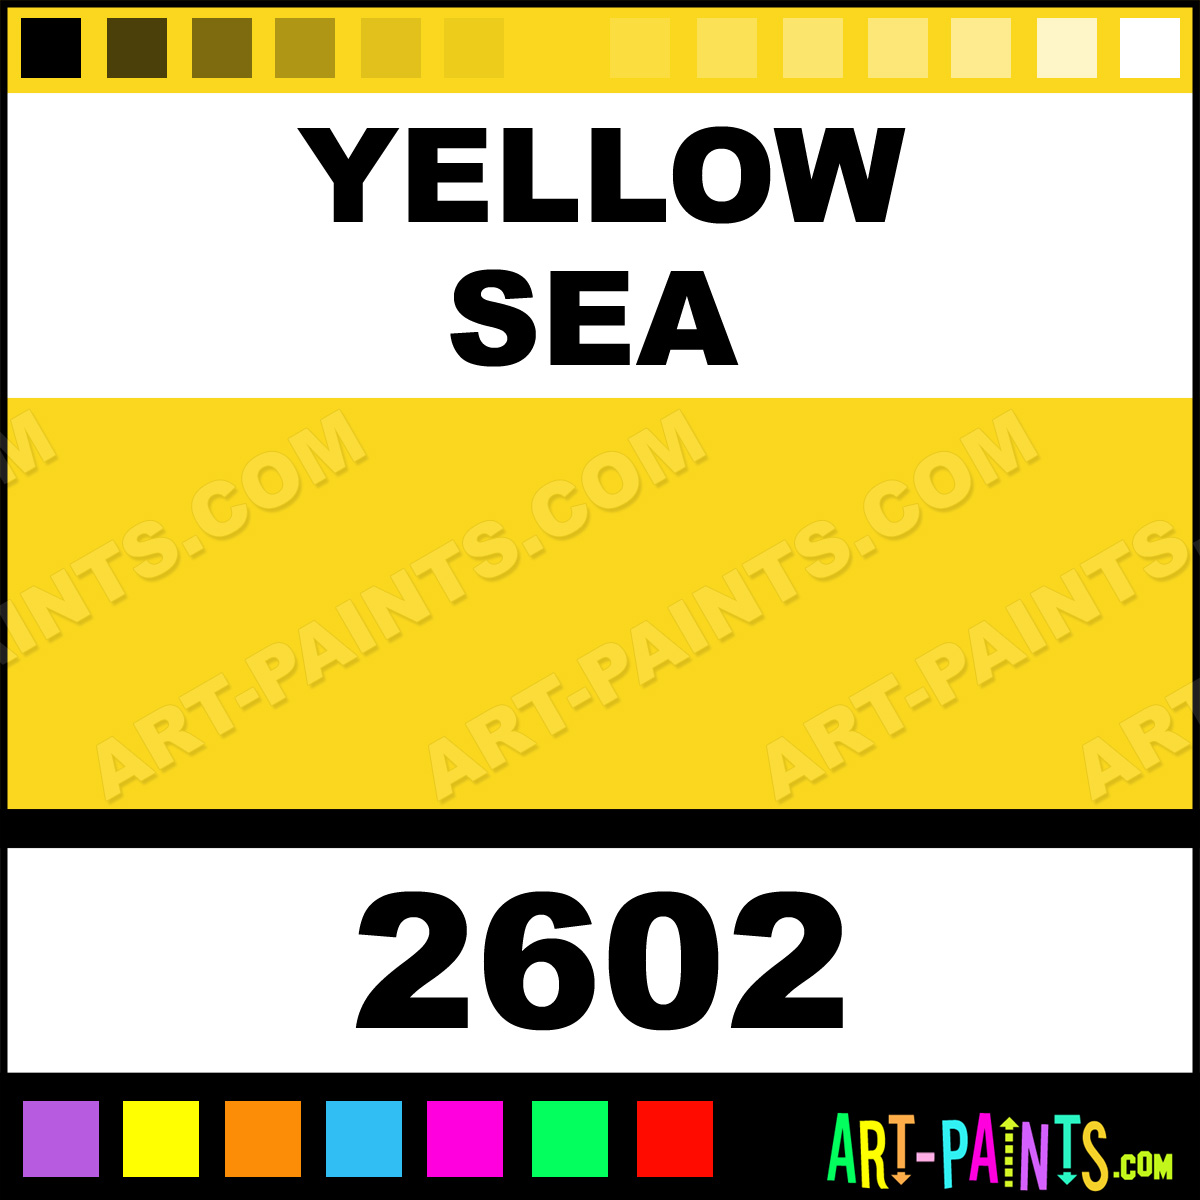 yellow sea h2o latex spray paints 2602 yellow sea. Black Bedroom Furniture Sets. Home Design Ideas